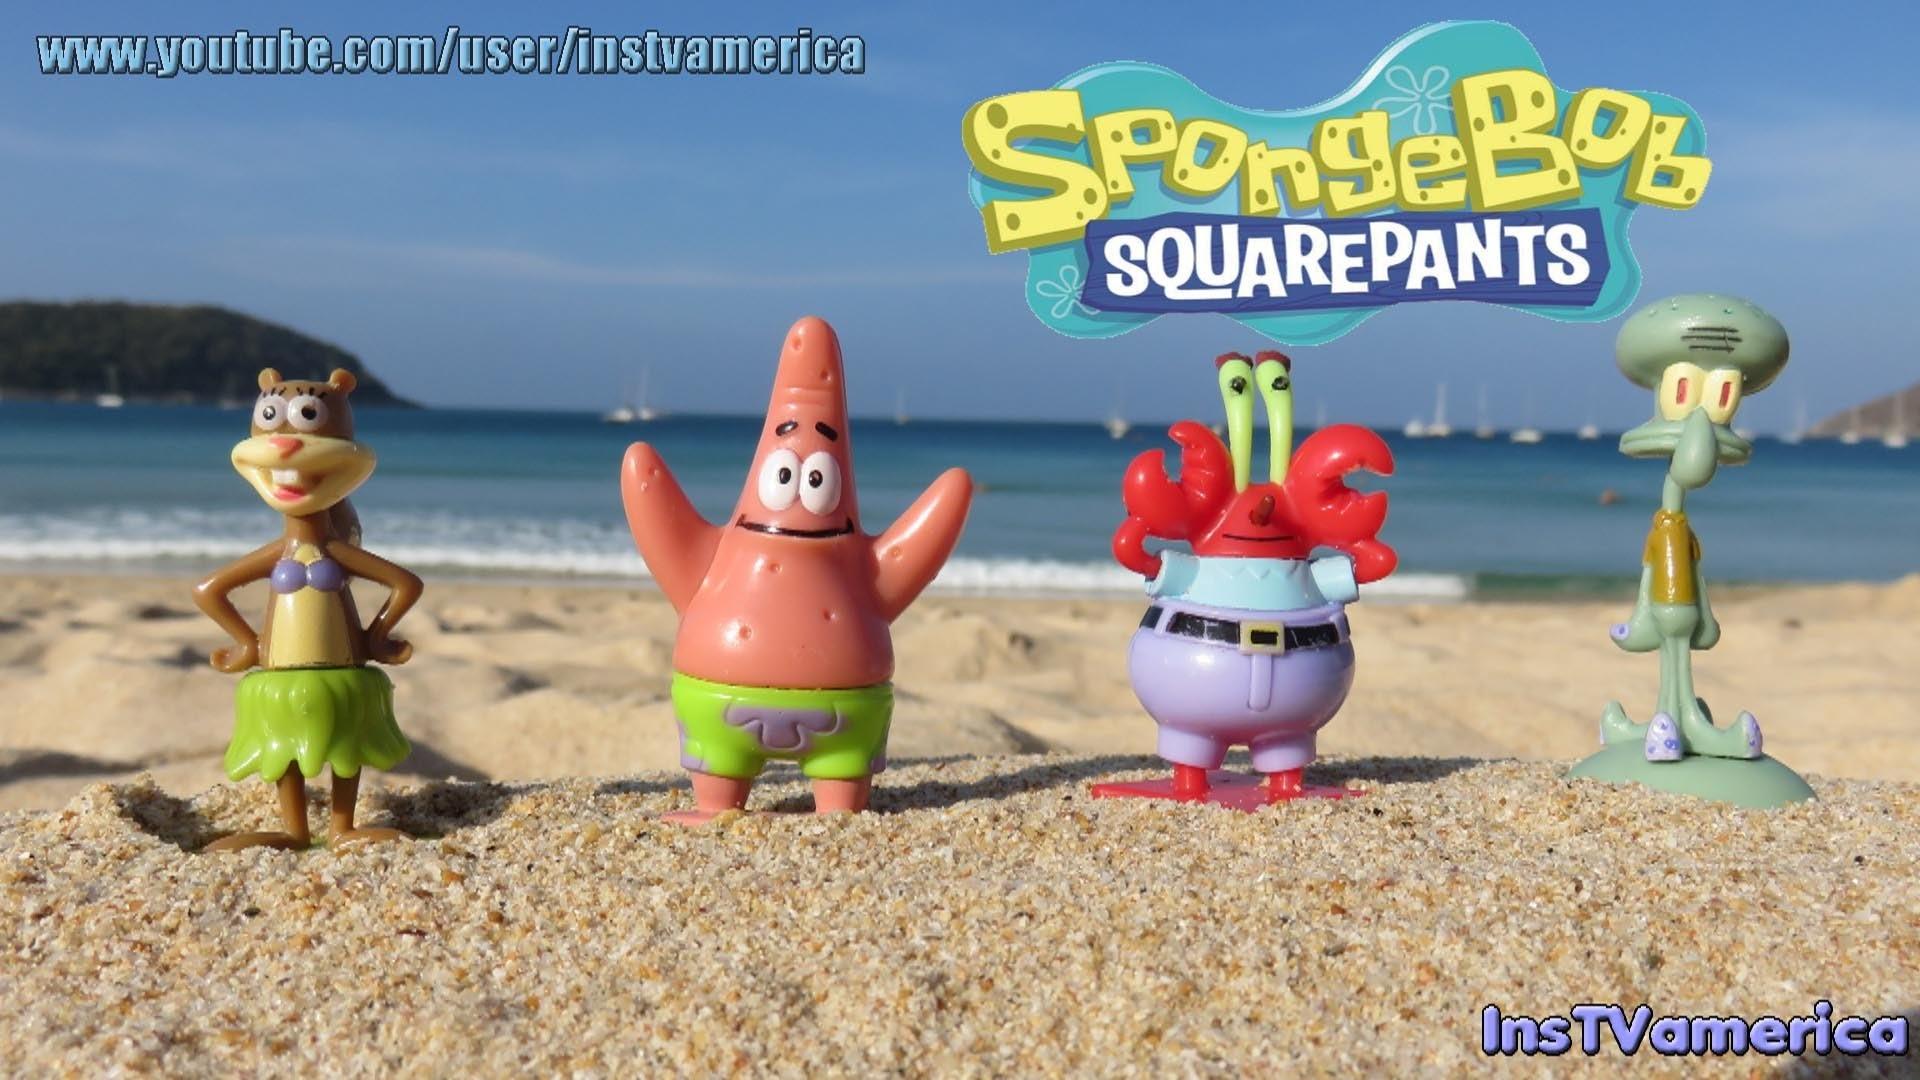 SpongeBob SquarePants friends Mr Krabs Squidward Patrick Star Sandy Mini  Figure Toys – YouTube